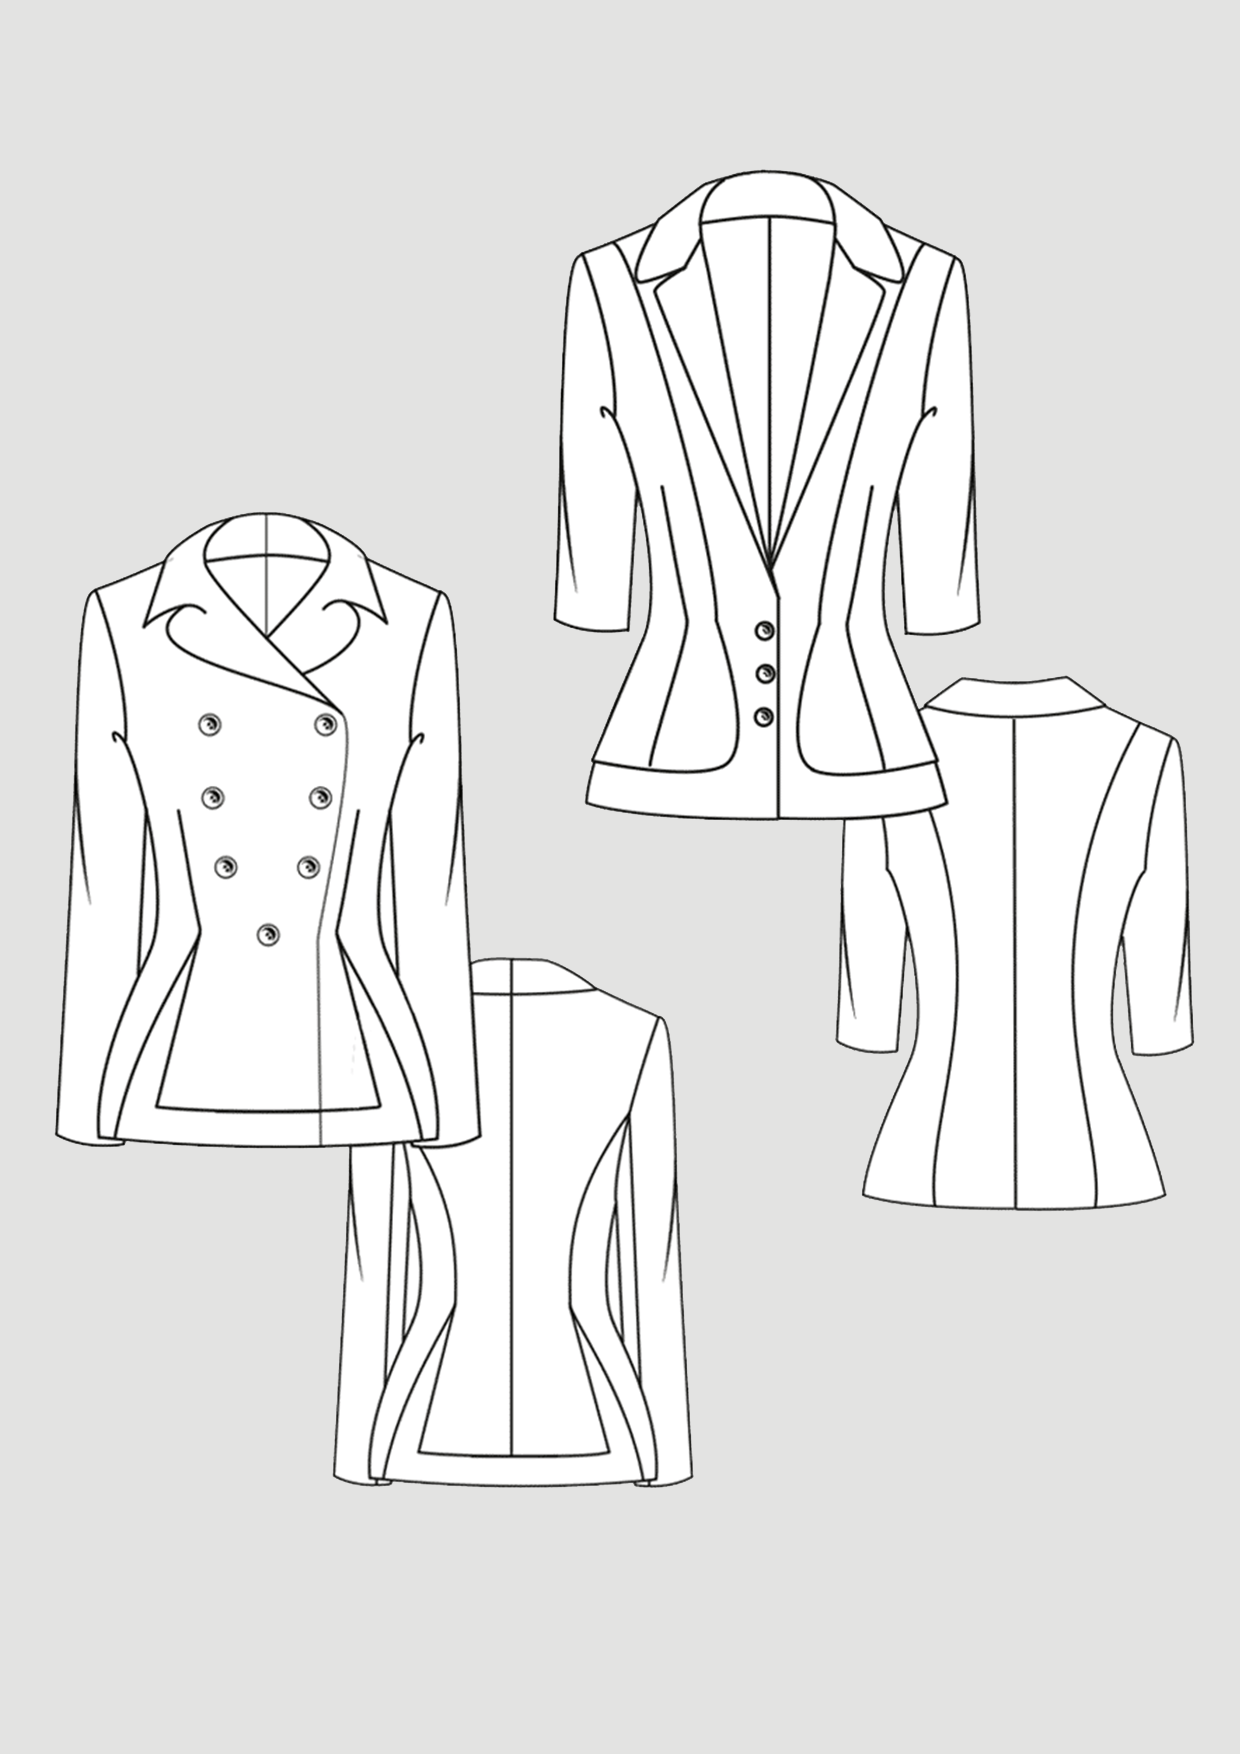 Produkt: Schnittmuster Taillierte Jacken